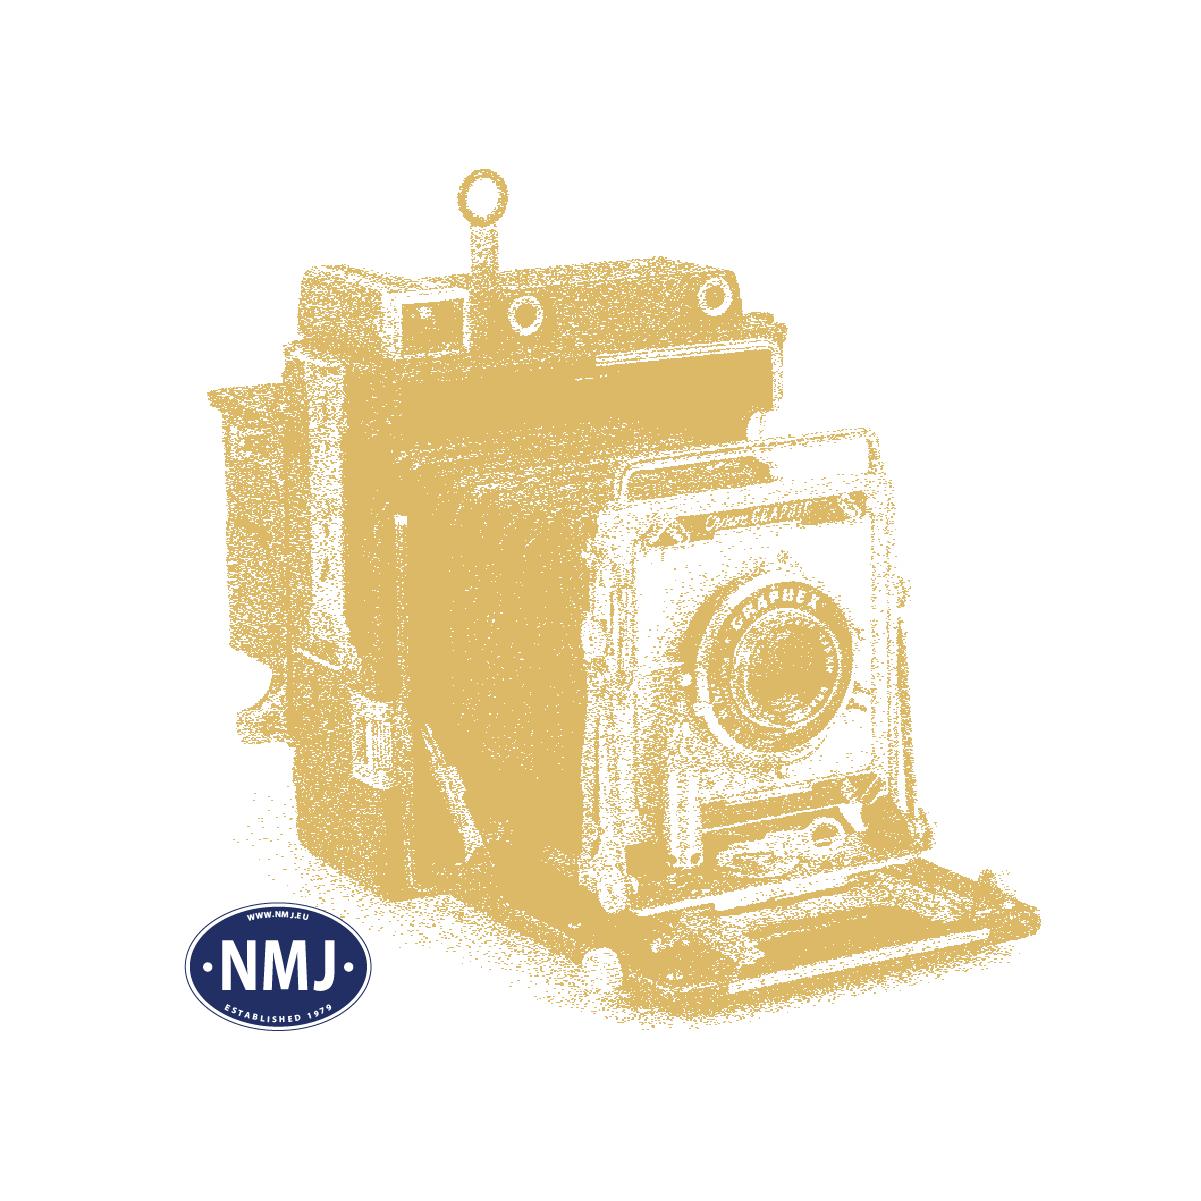 NMJT504.501 - NMJ Topline NSB His 210 2 773-9